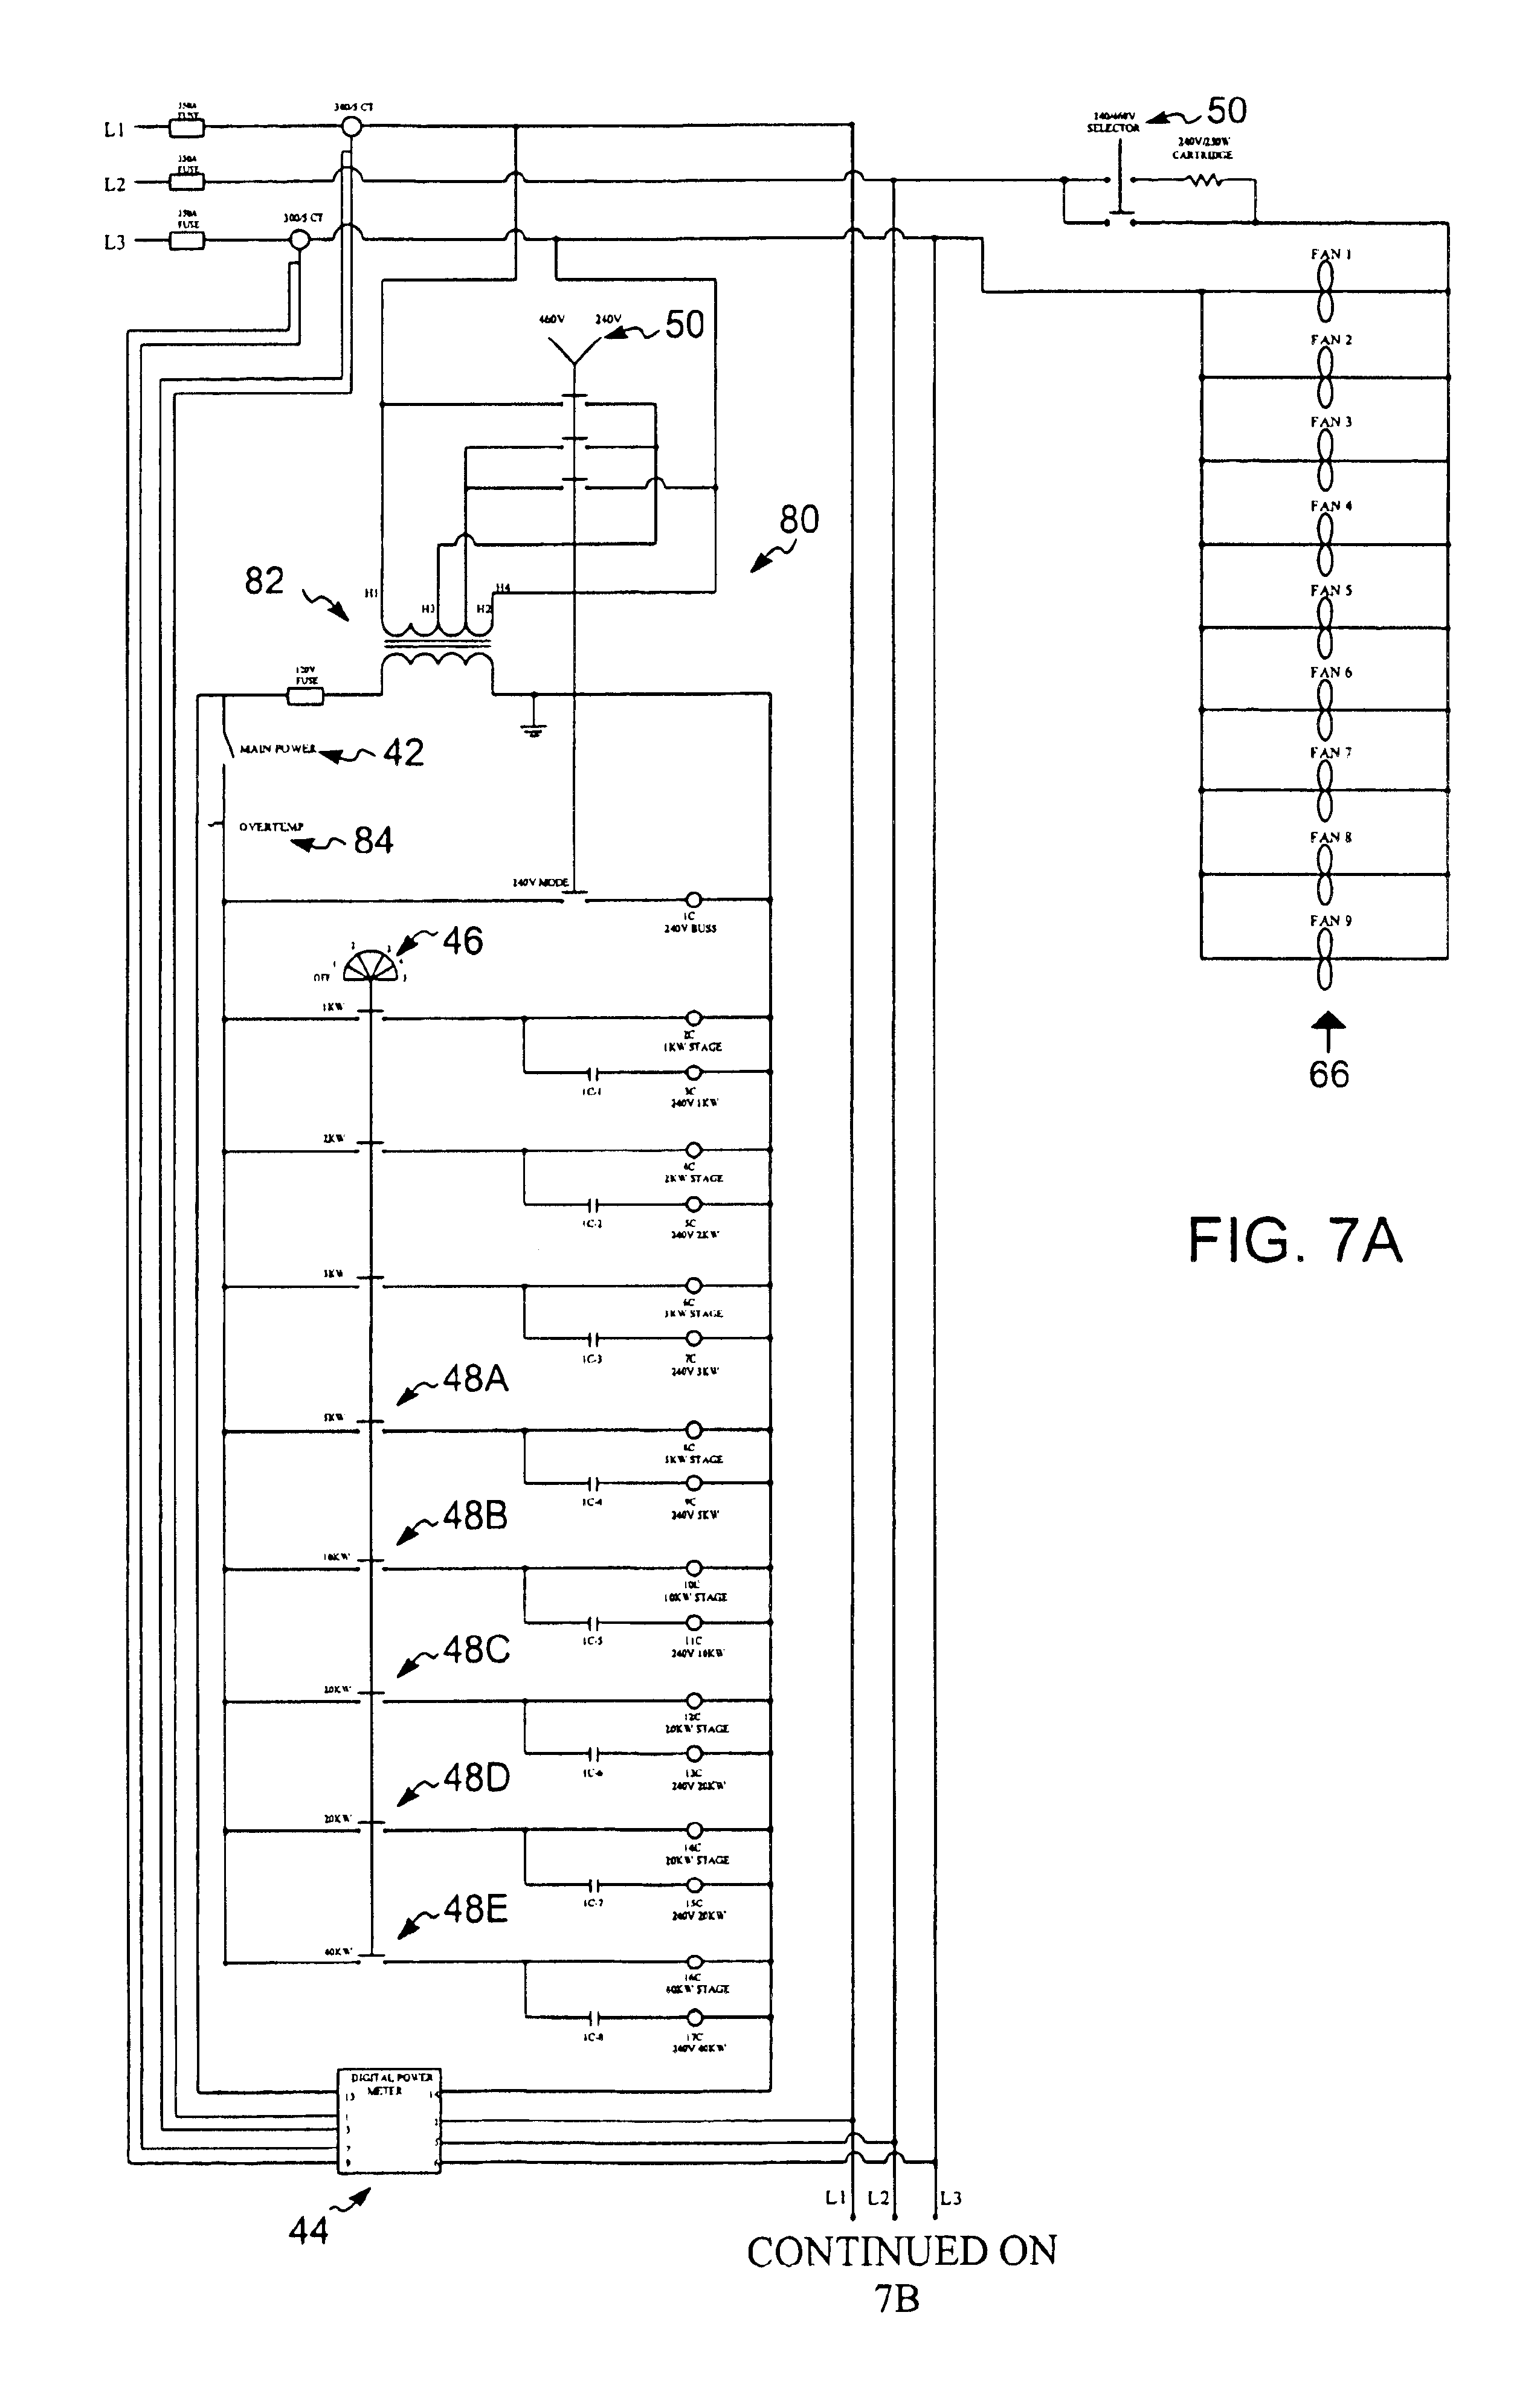 Ac Triac Dimmer Circuit Design Help Resistive Load Diagram Bank Wiring 34